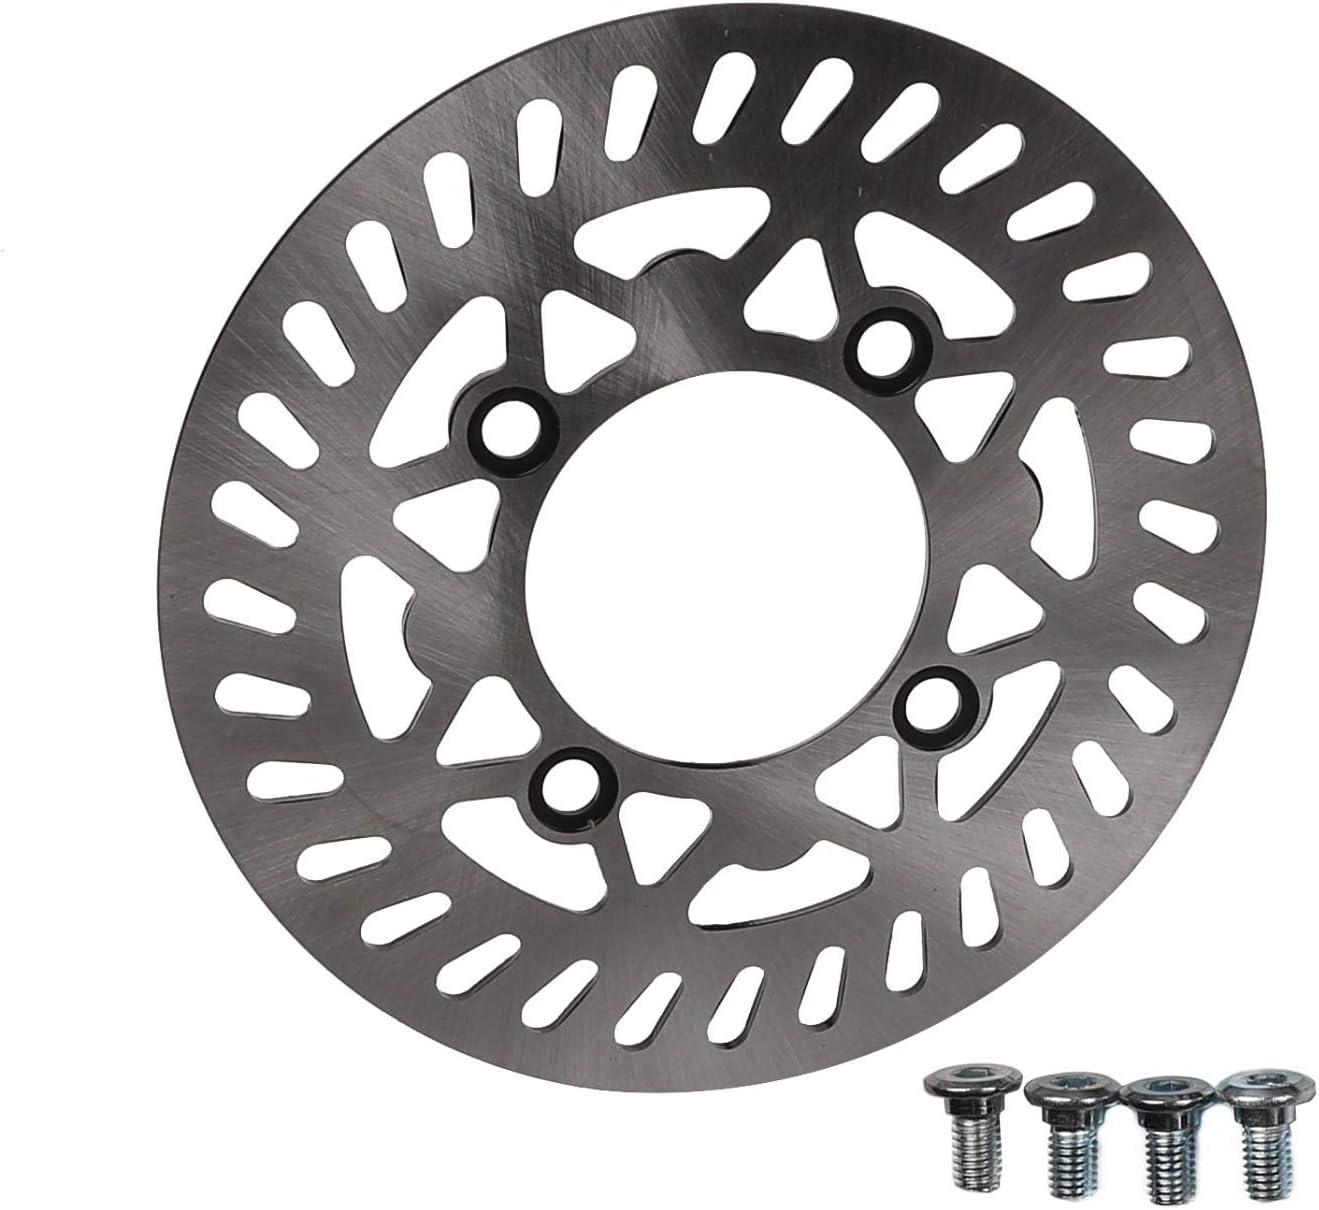 WPHMOTO 210mm Front Brake Disc Rotor for Dirt Pit Bike 70cc 90cc 110cc 125cc 150cc 160cc CRF KLX SSR TTR